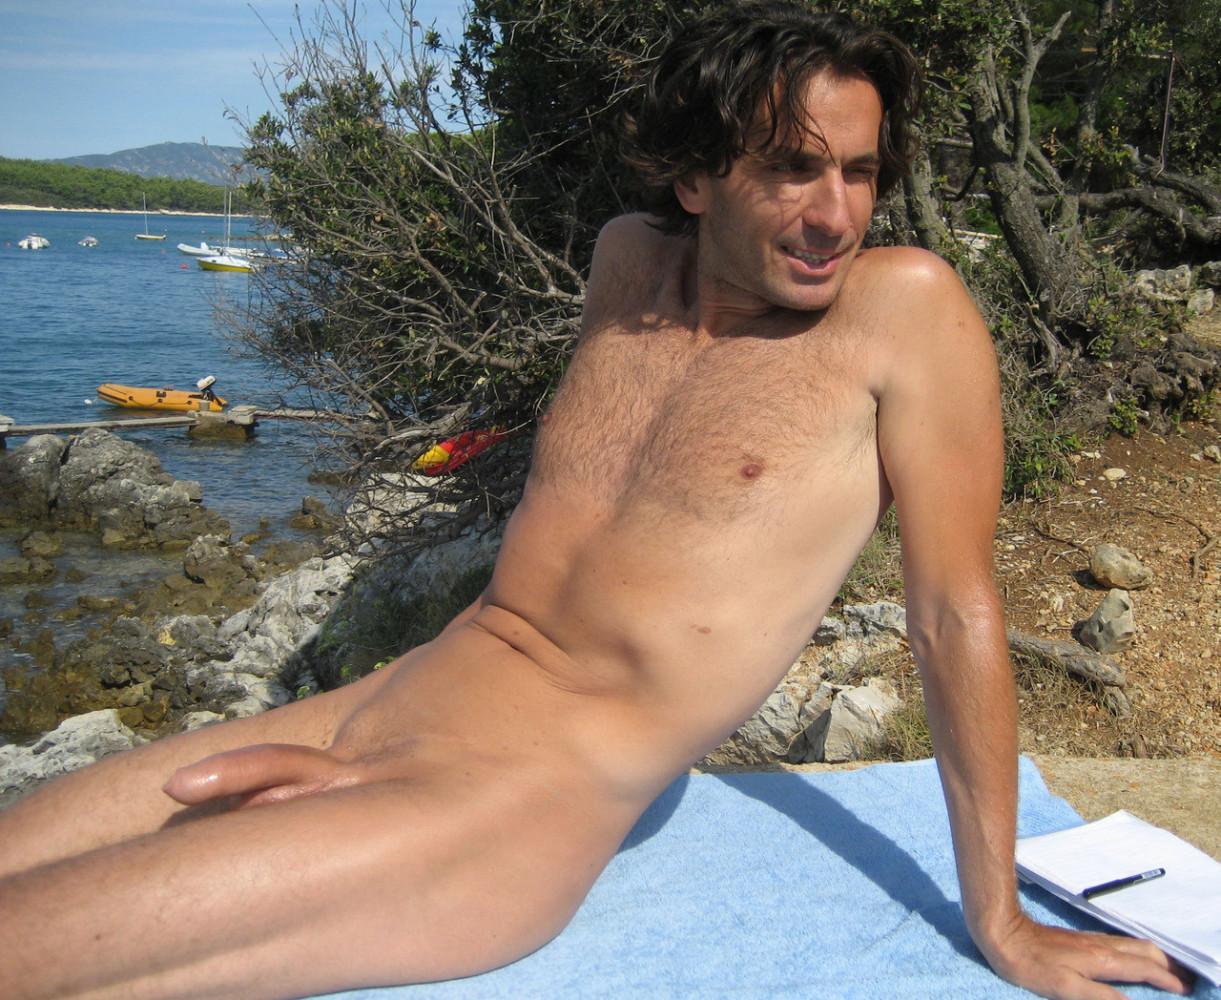 0ー3)tvn.hu nude imagesizenudist family porno 投 稿 画 像 61 枚